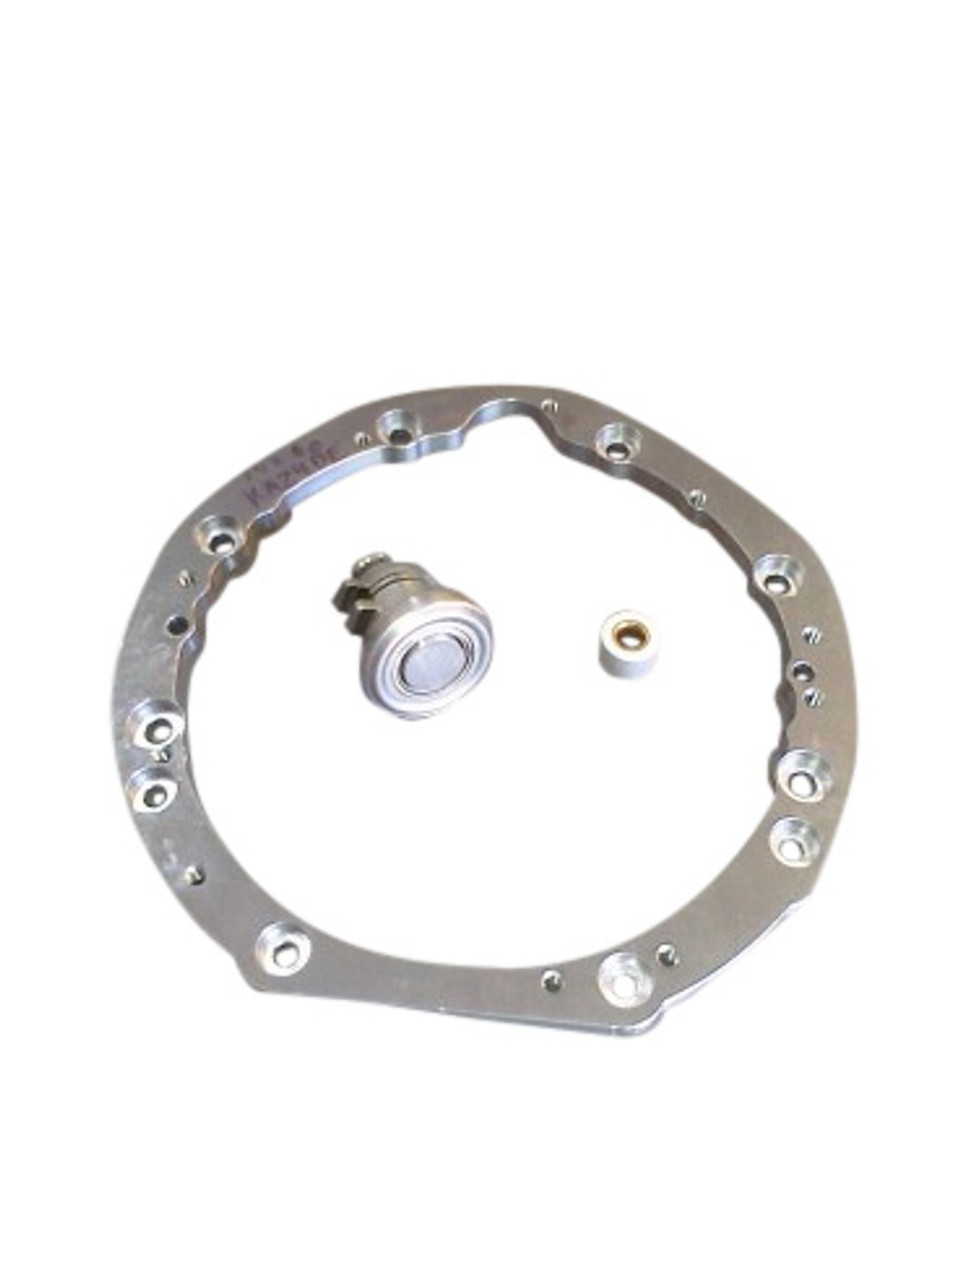 Collins Performance 1UZ To KA24DE Transmission Adapter Plate